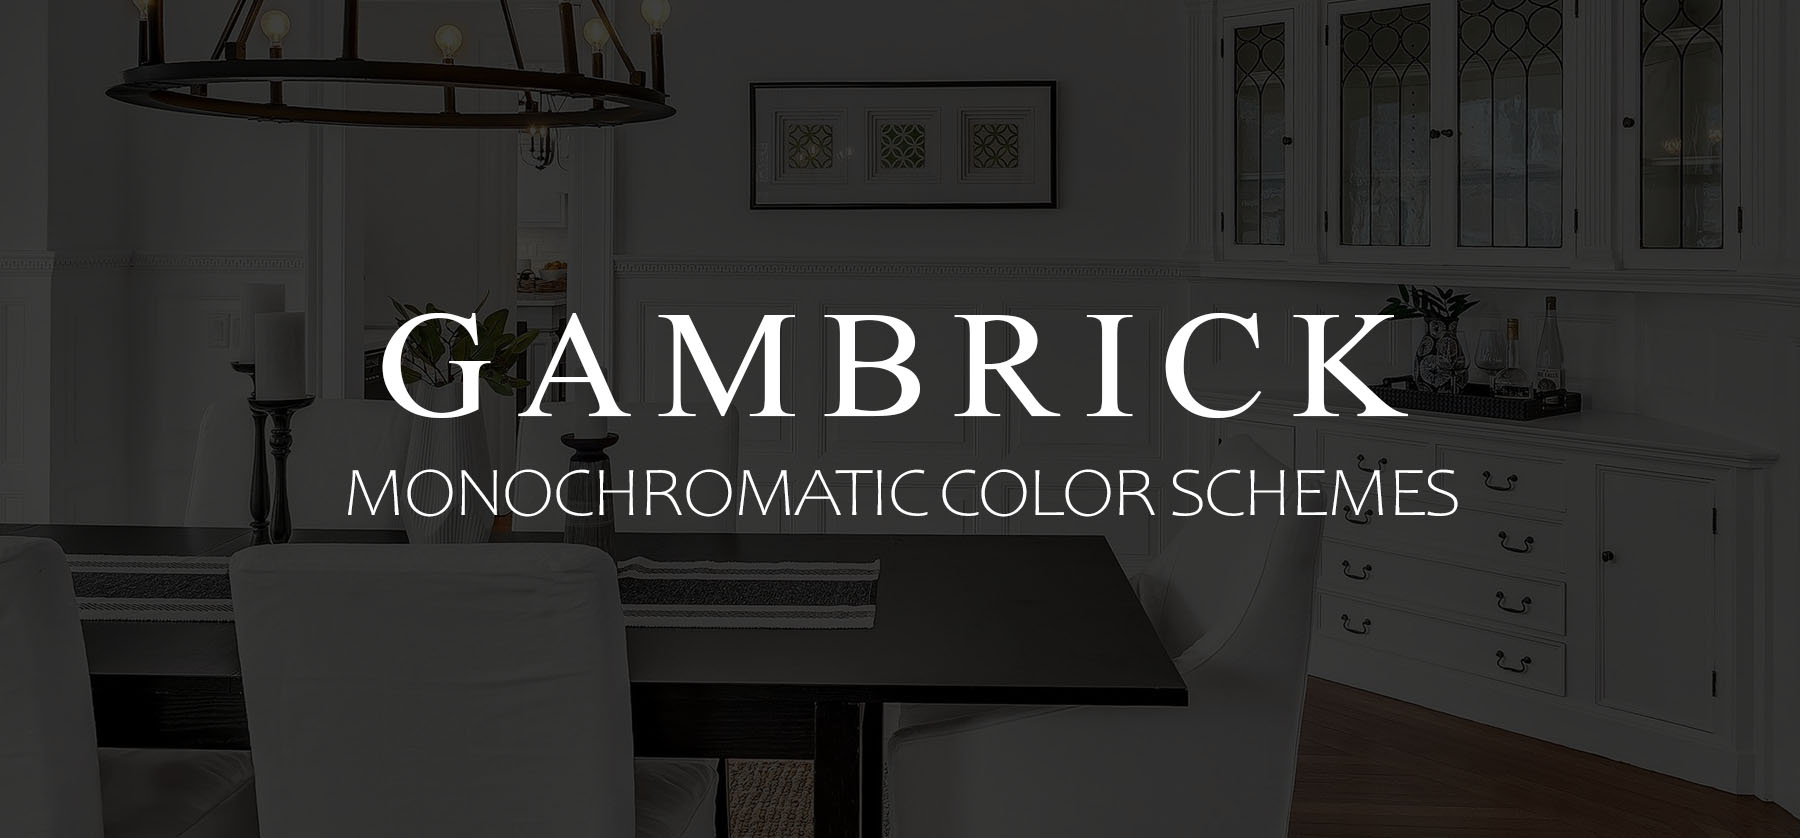 Monochromatic color schemes banner picture